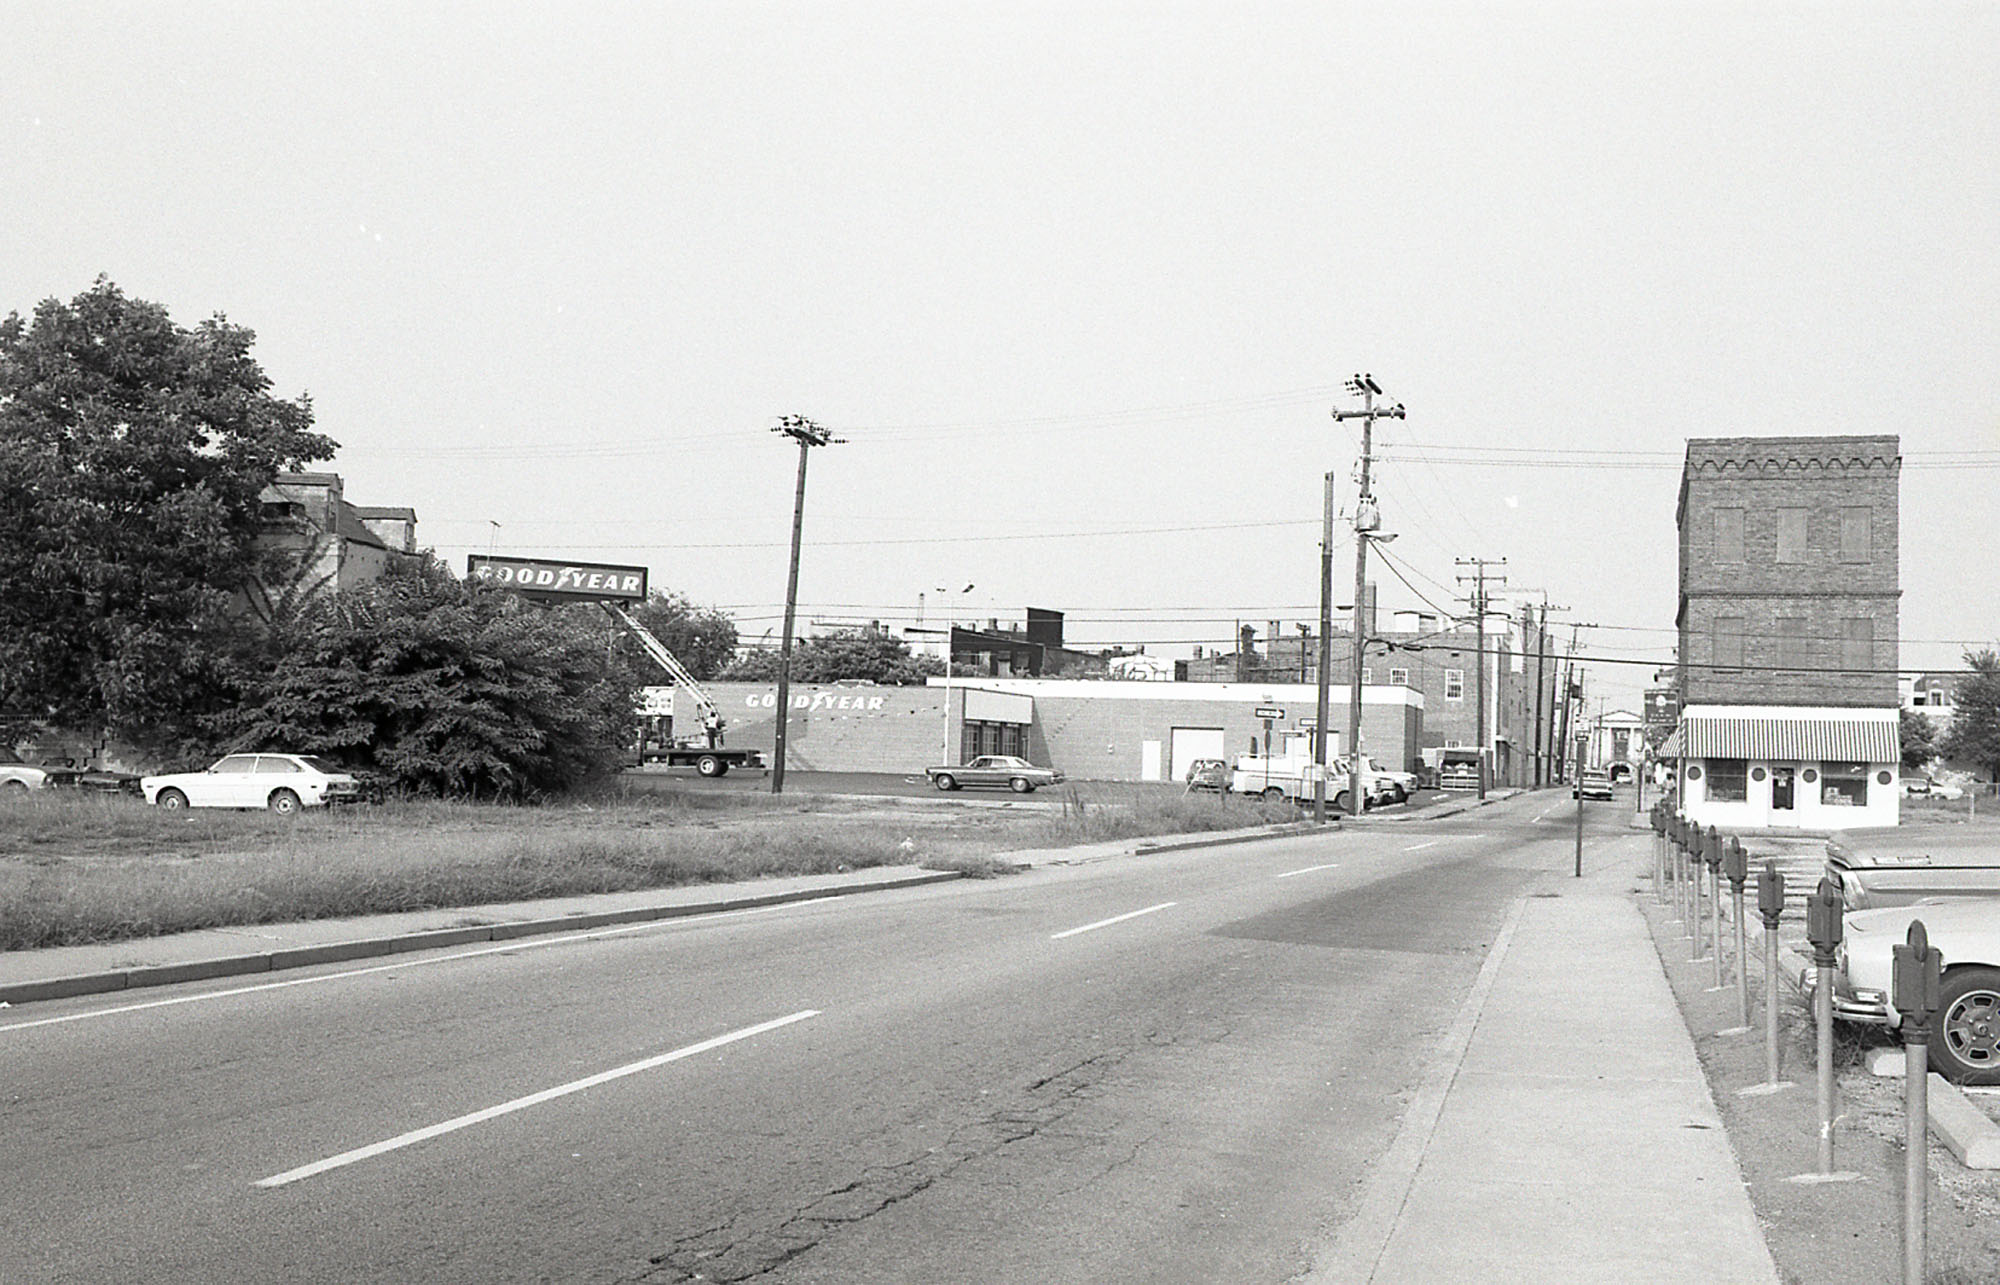 Photographic Survey: Charleston Center Site 16